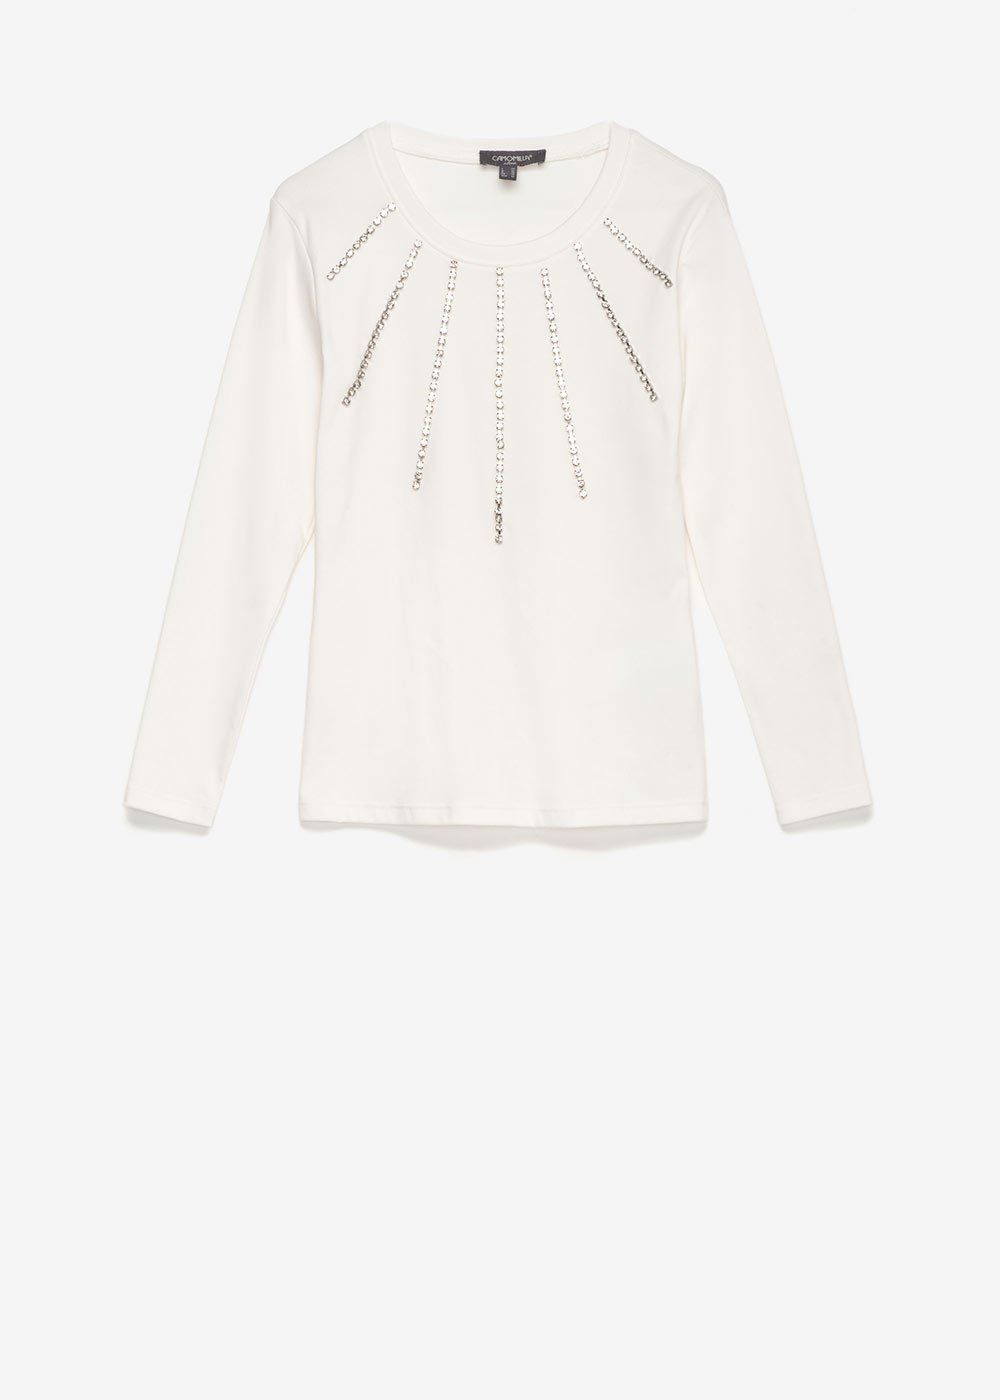 T-shirt Sabrin con strass - White - Donna